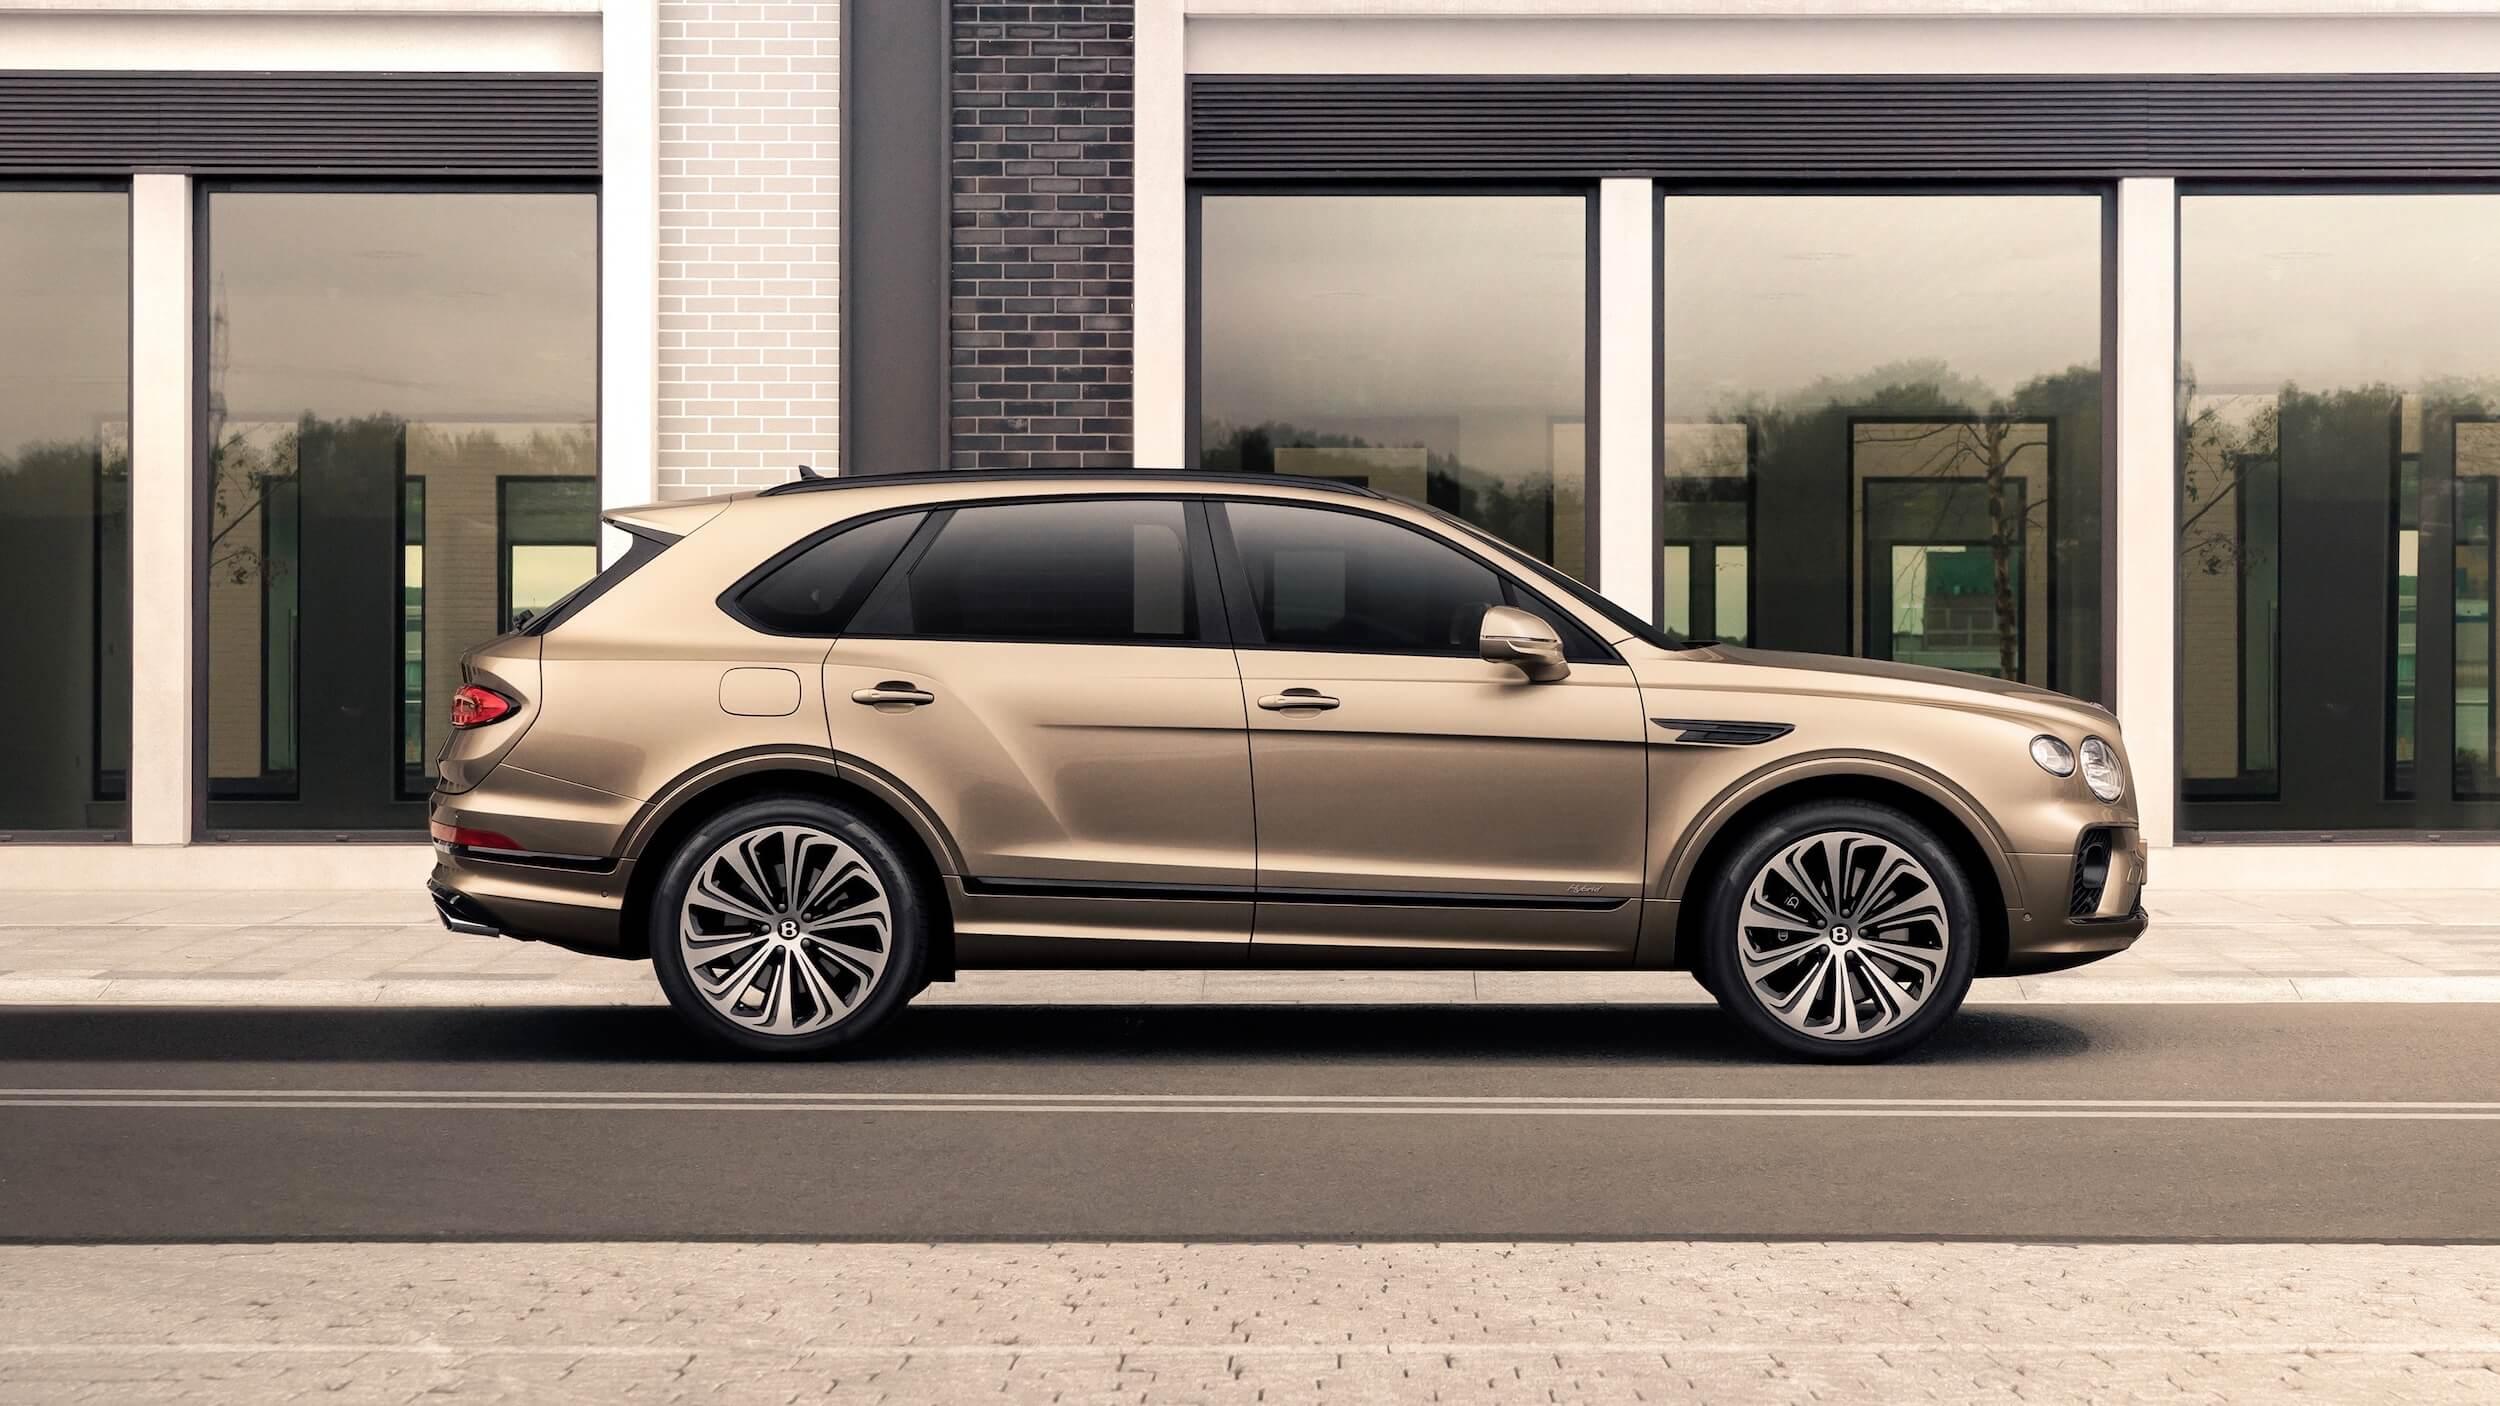 2021 Bentley Bentayga PHEV opladen